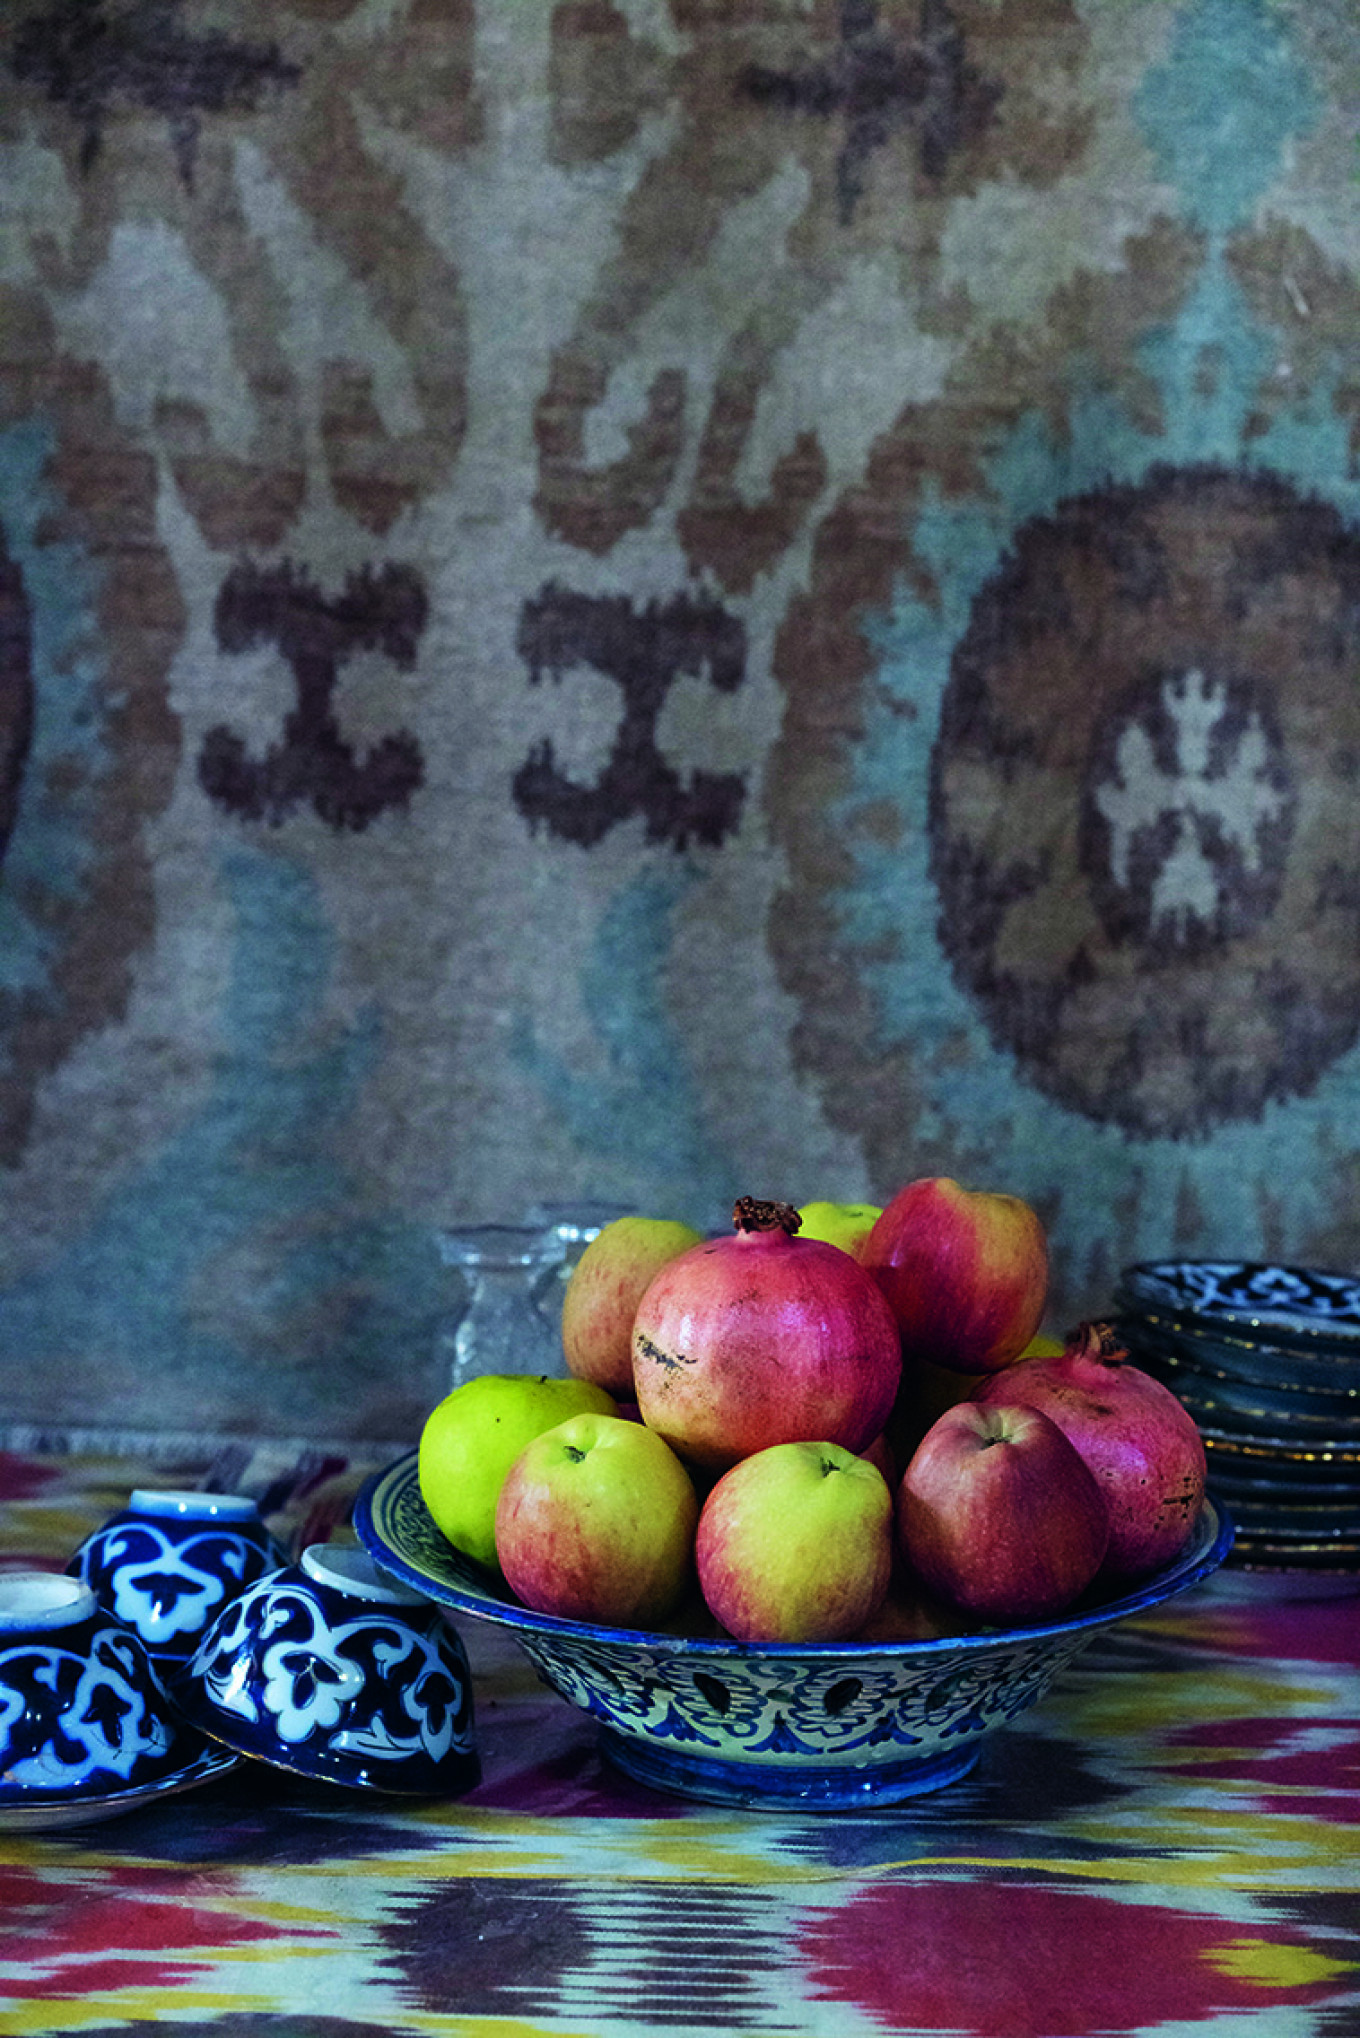 Ikat cloth and fruit, Margilan Theodore Kaye